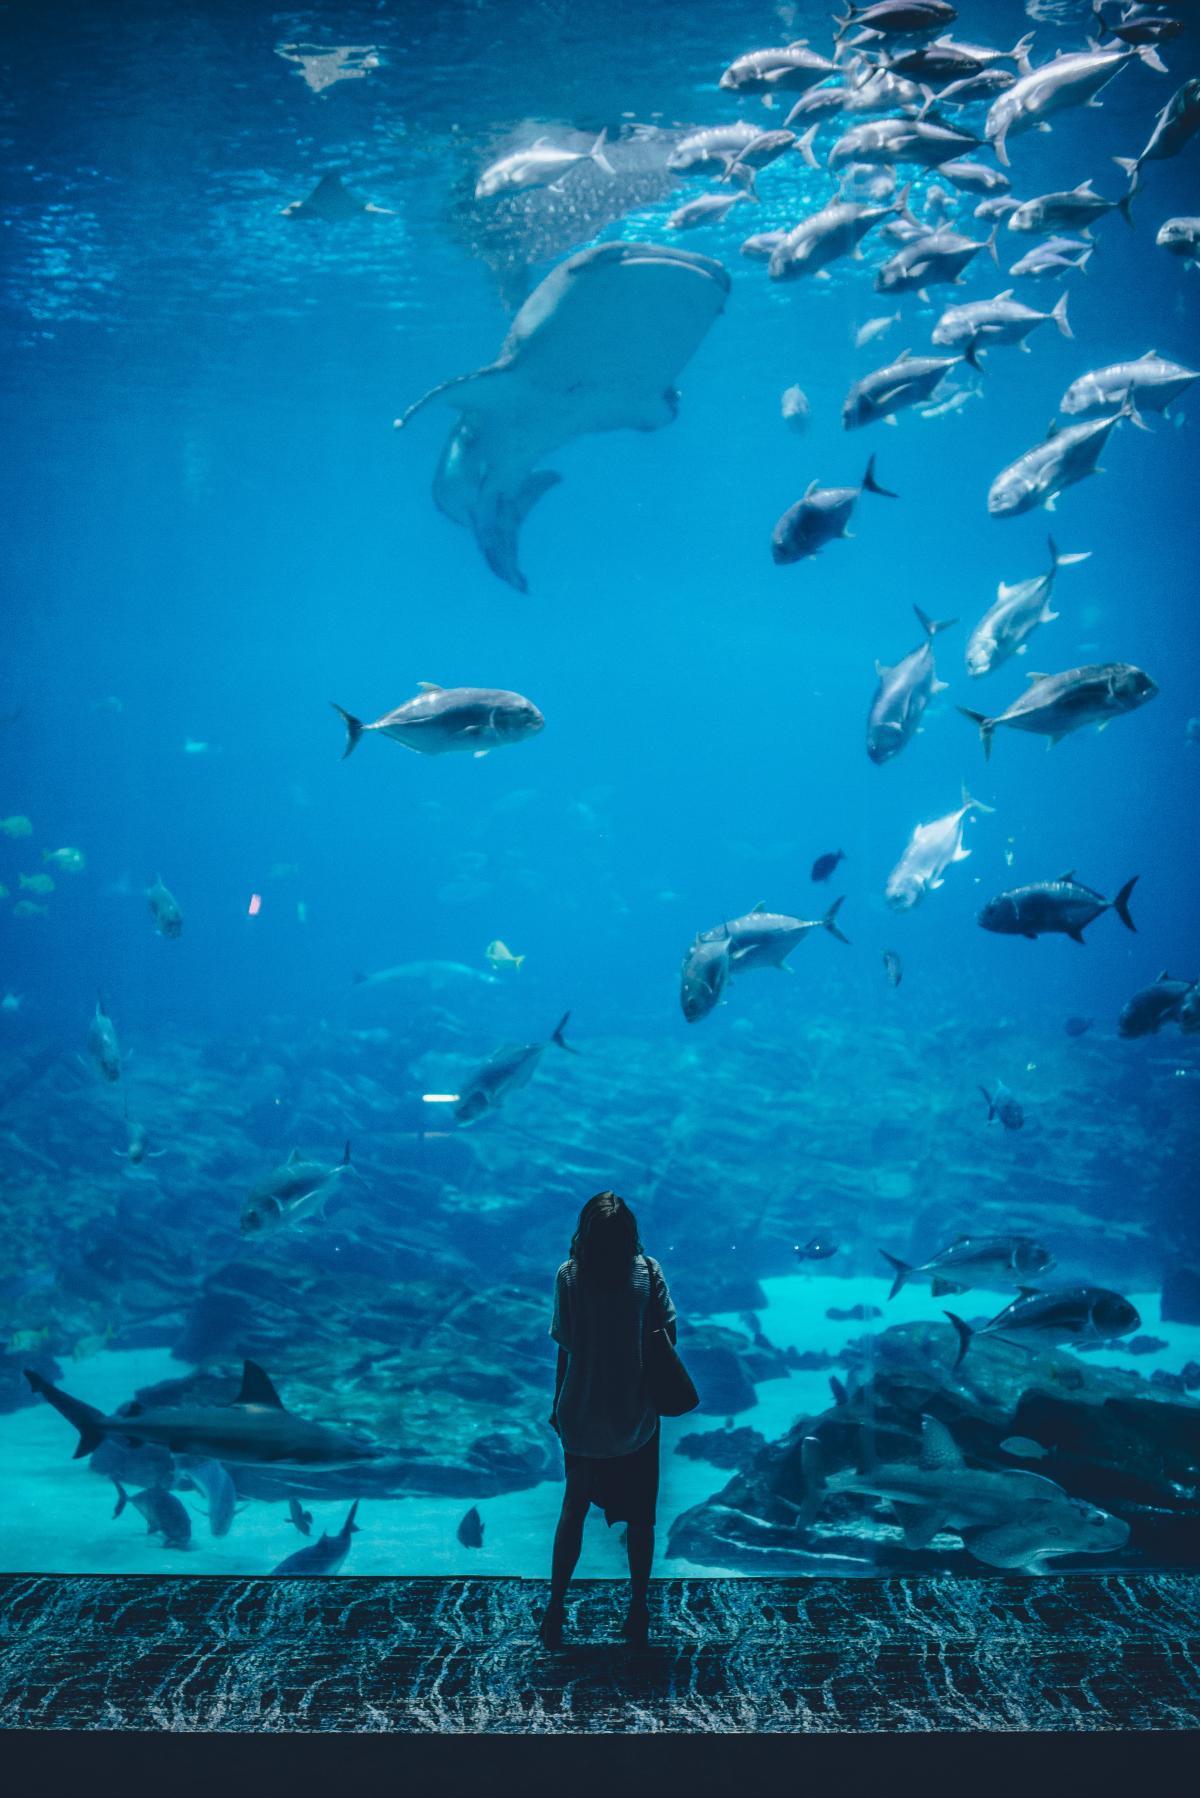 Shark Hammerhead Reef #56351